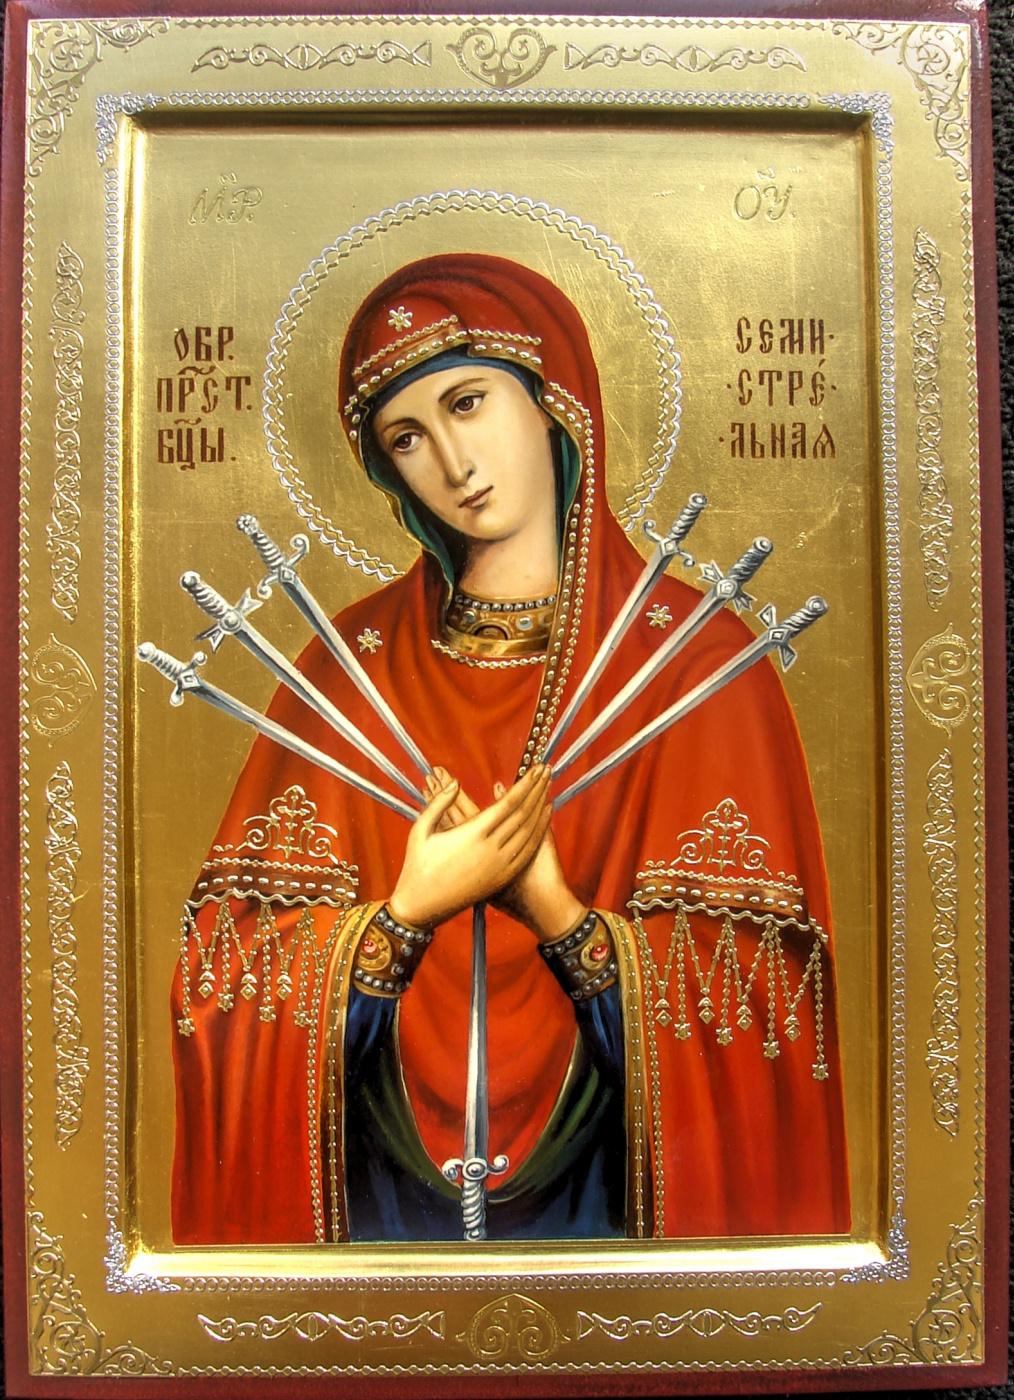 Sergey Pavlovich Kolko. Image Prvt Virgin Mary Seven Arrows